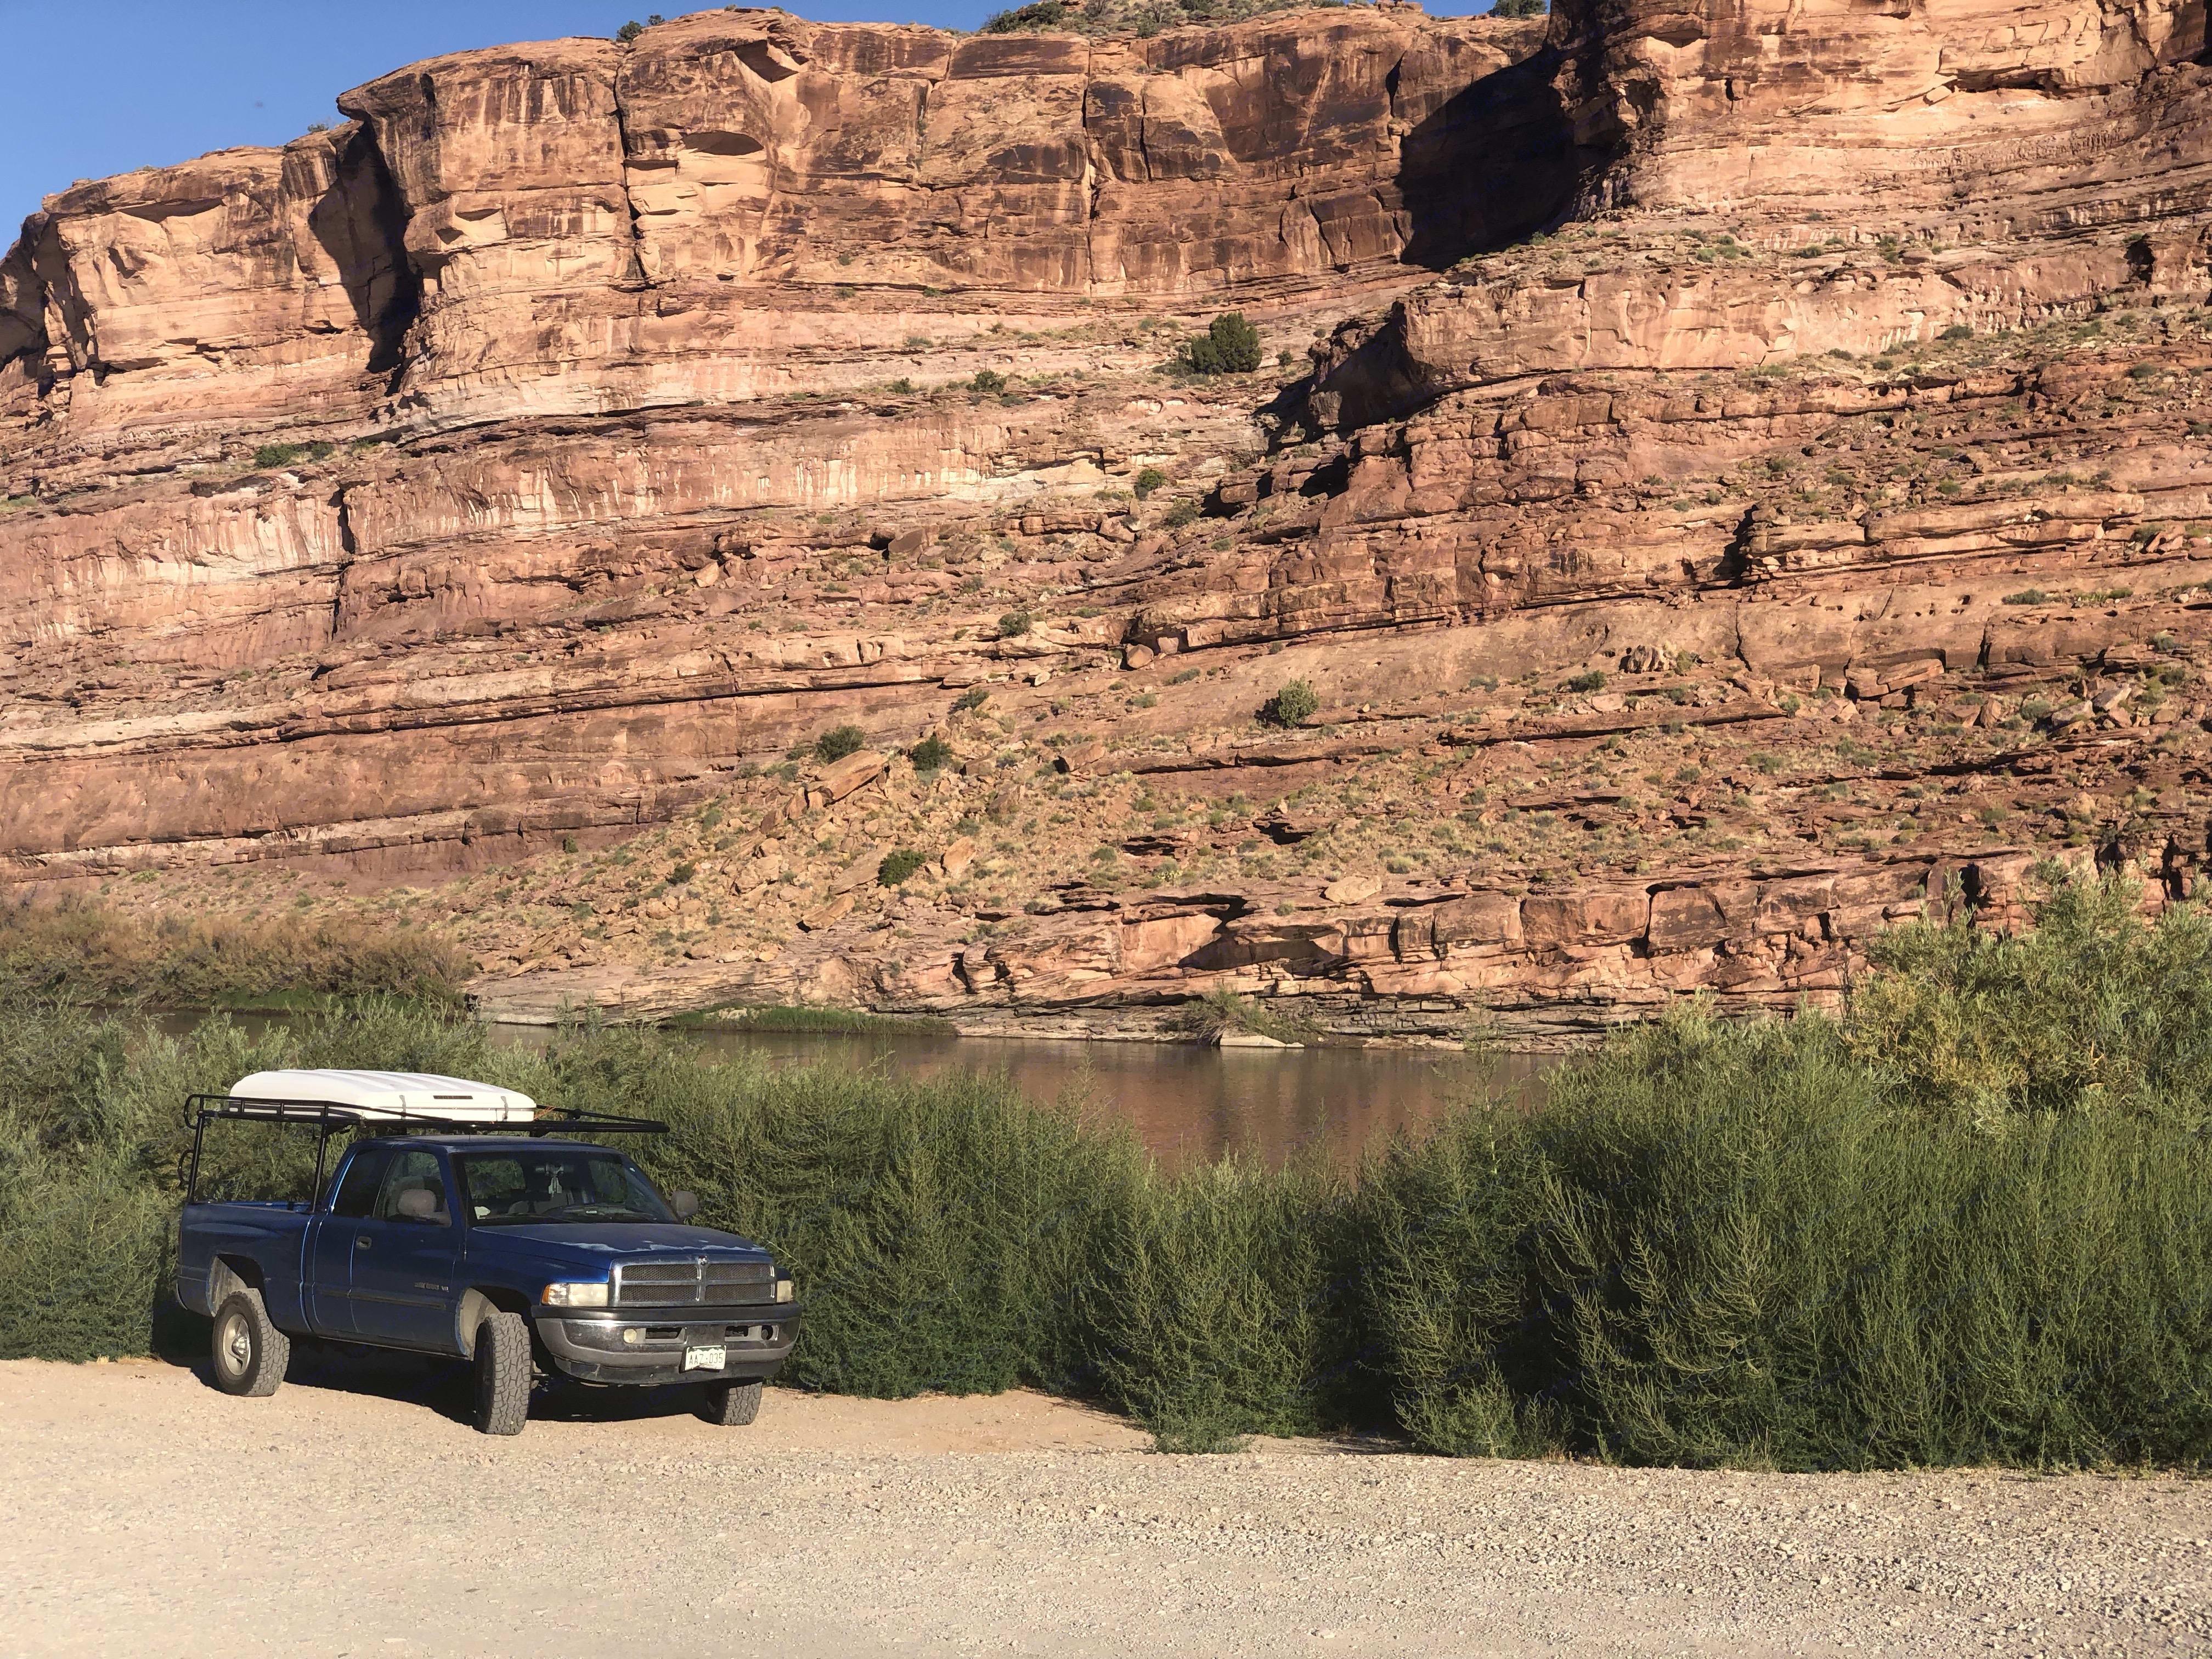 Colorado river near Moab in Utah. dodge ram 1500 2001